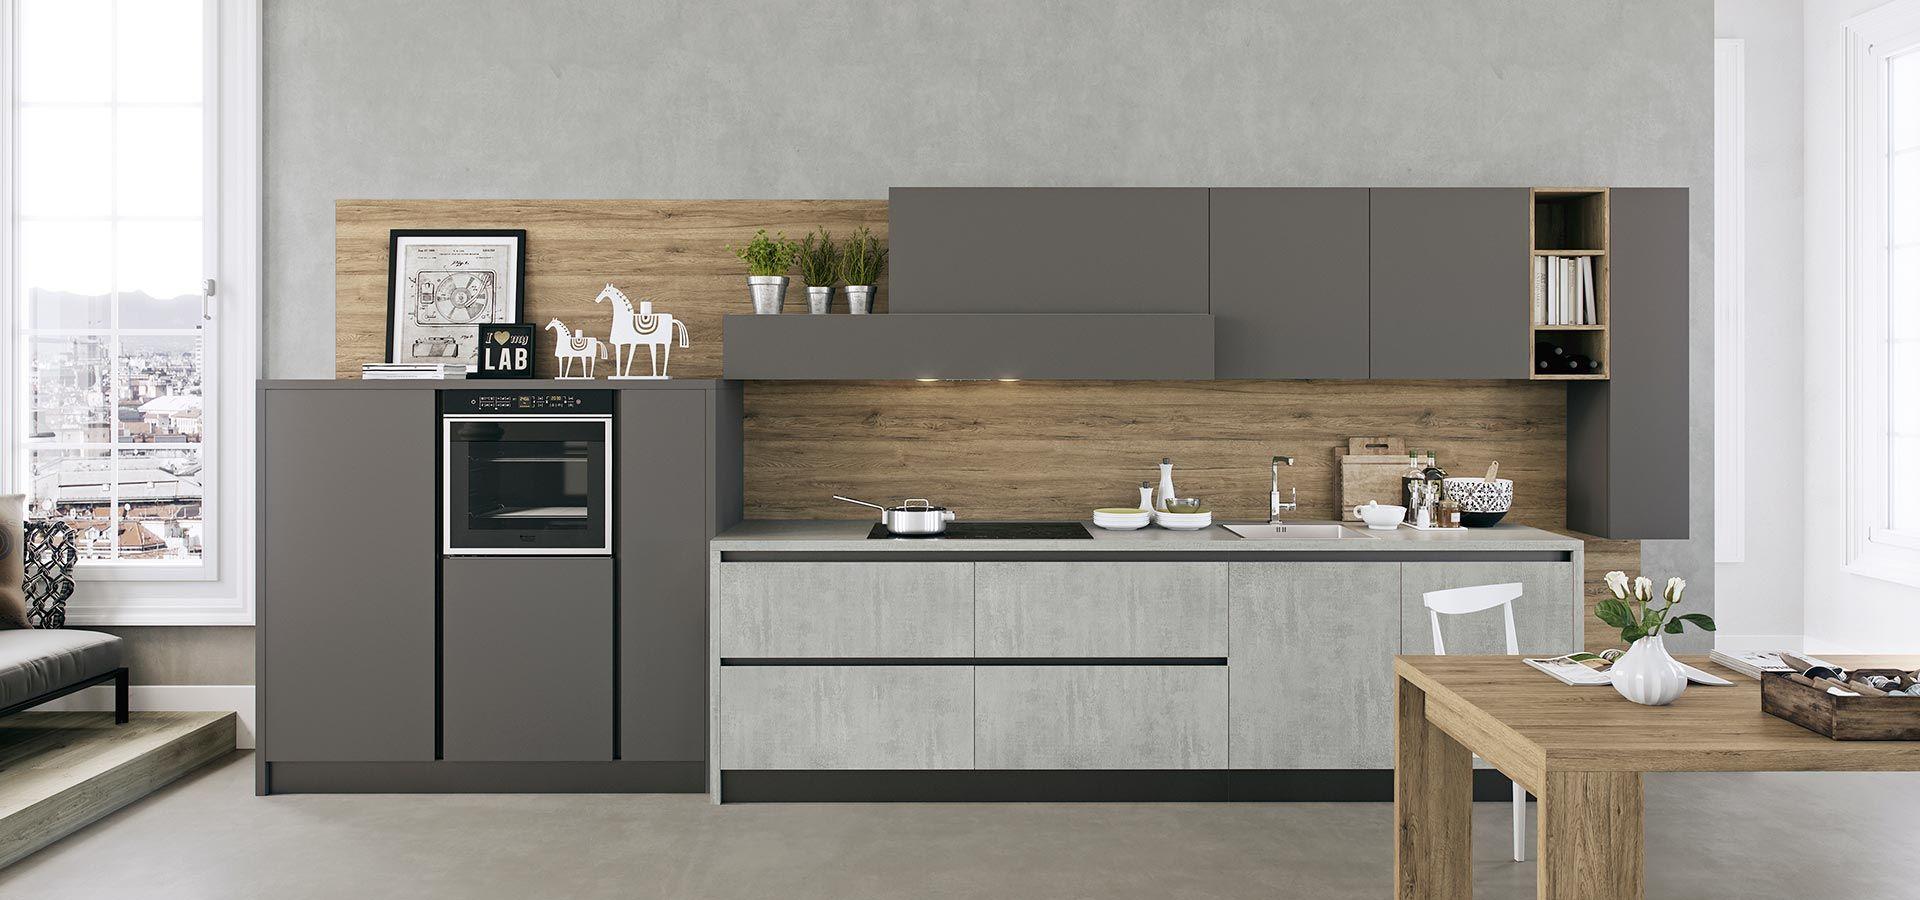 cuisine kali am nagement pinterest am nagement et cuisines. Black Bedroom Furniture Sets. Home Design Ideas